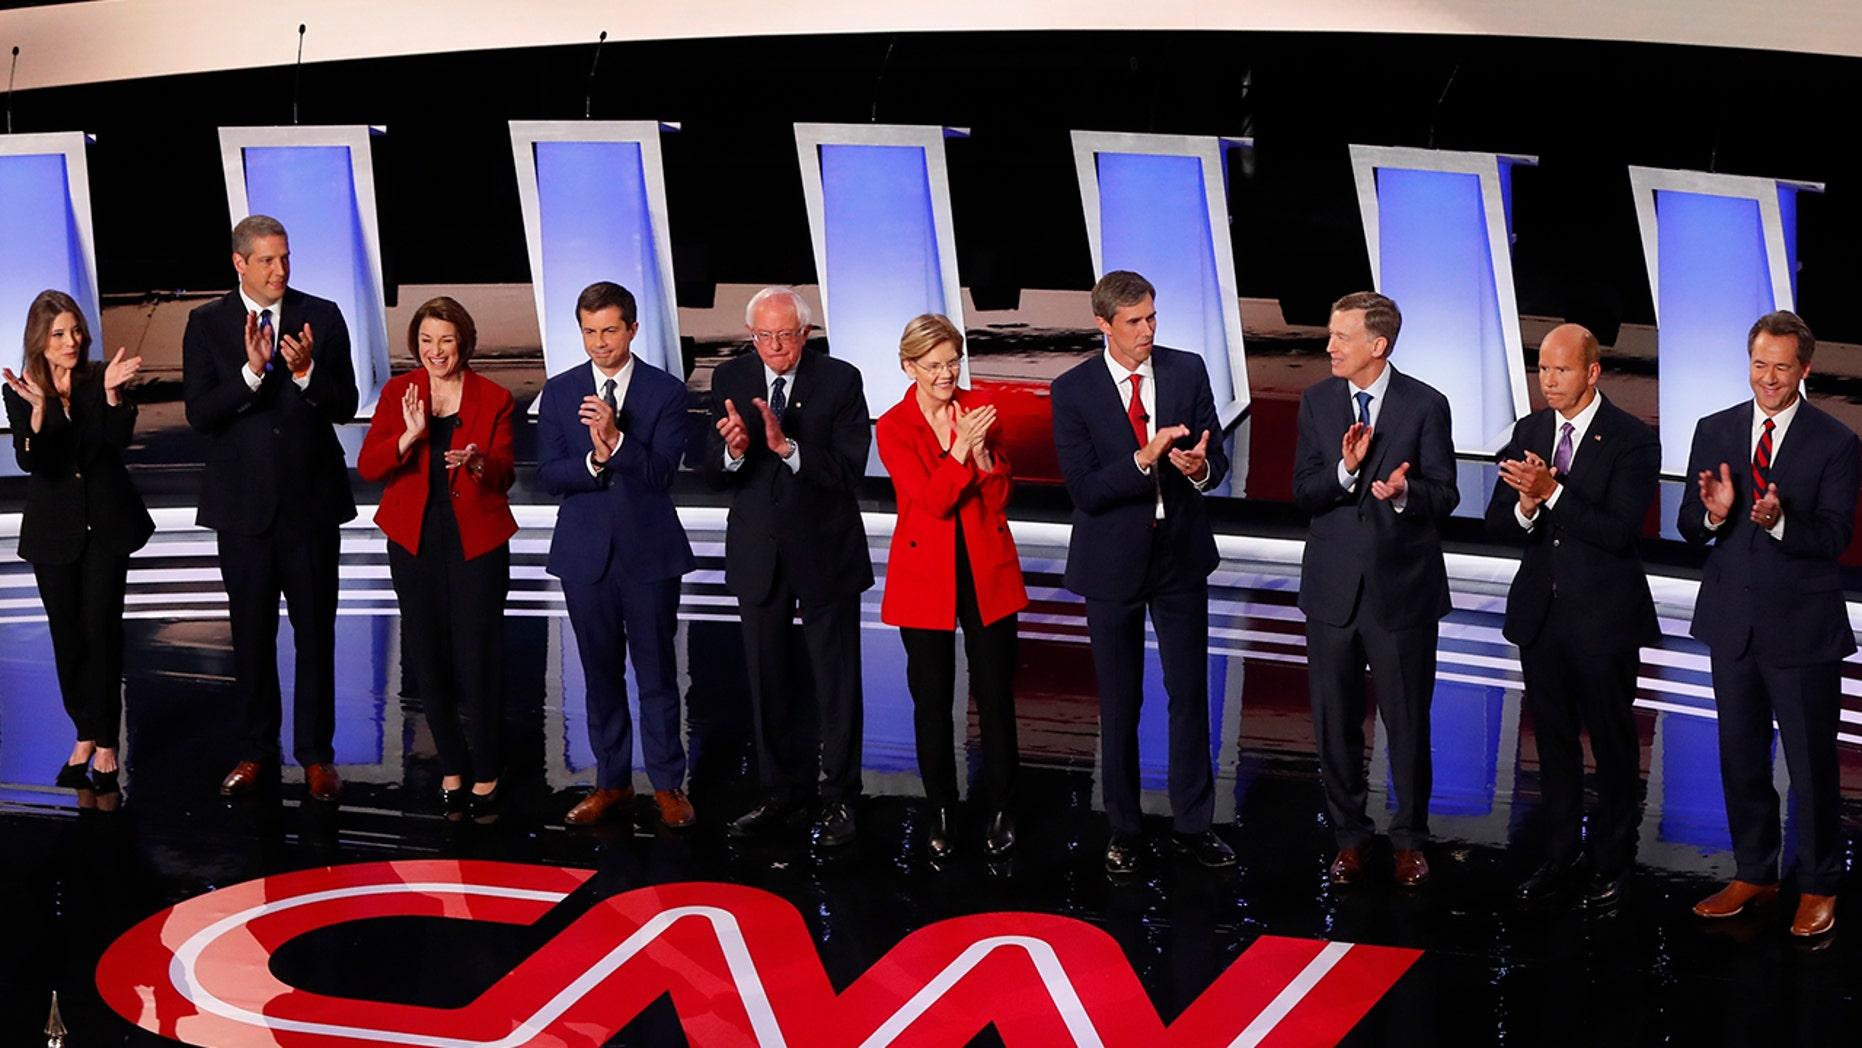 Critics have mocked CNN's over-the-top Democratic debate coverage. (AP Photo/Paul Sancya)